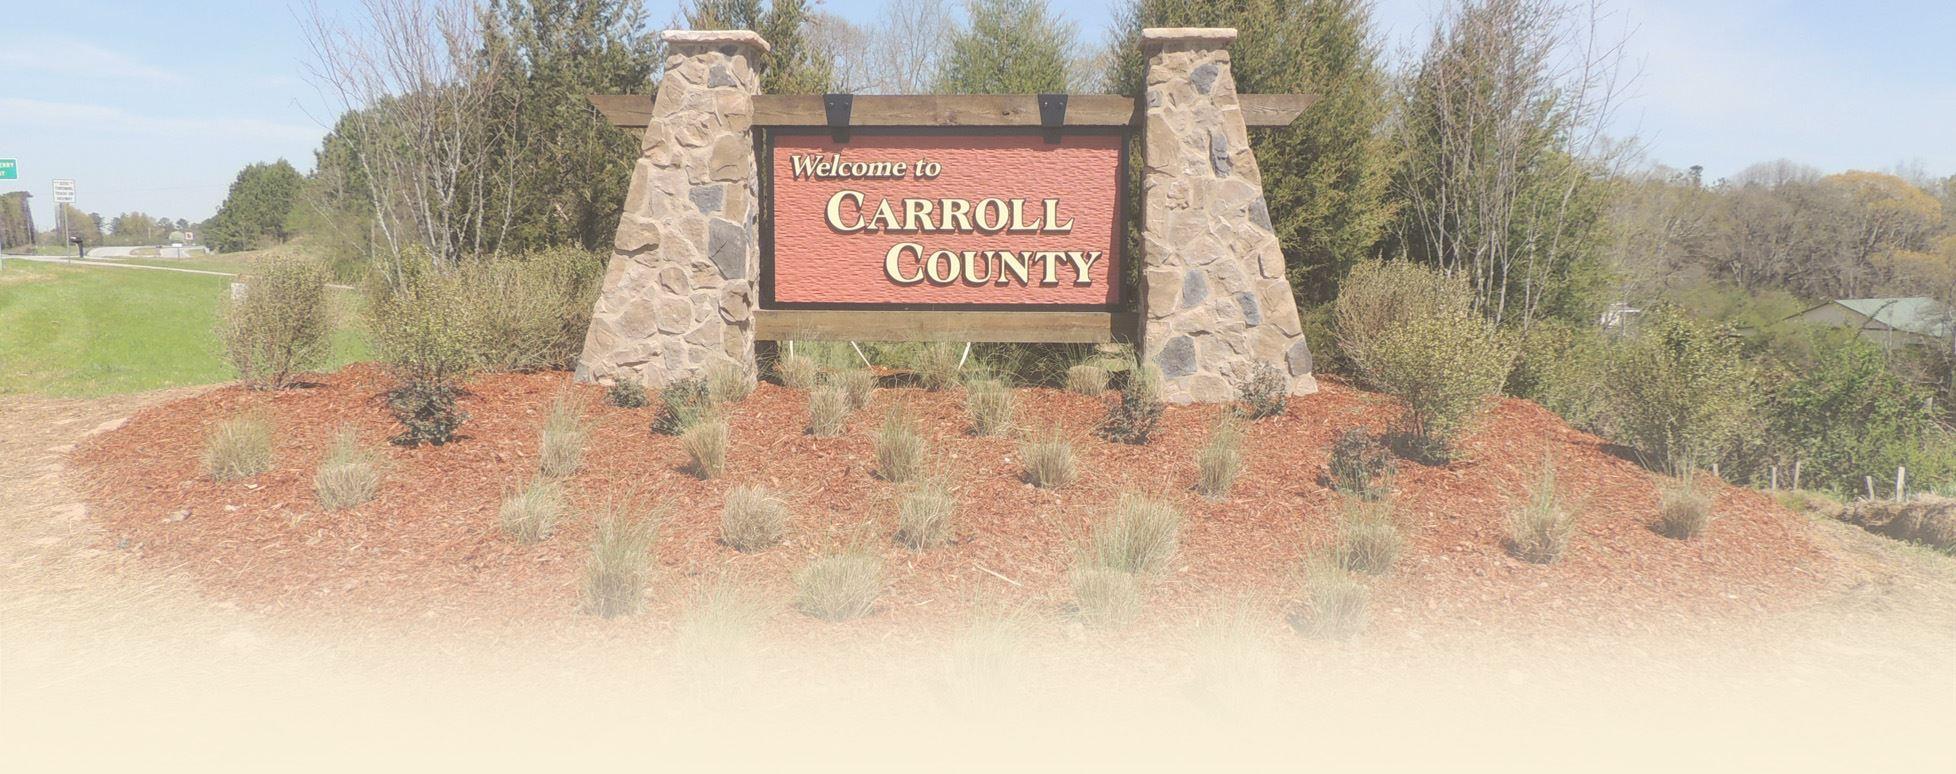 Carroll County Ga Official Website